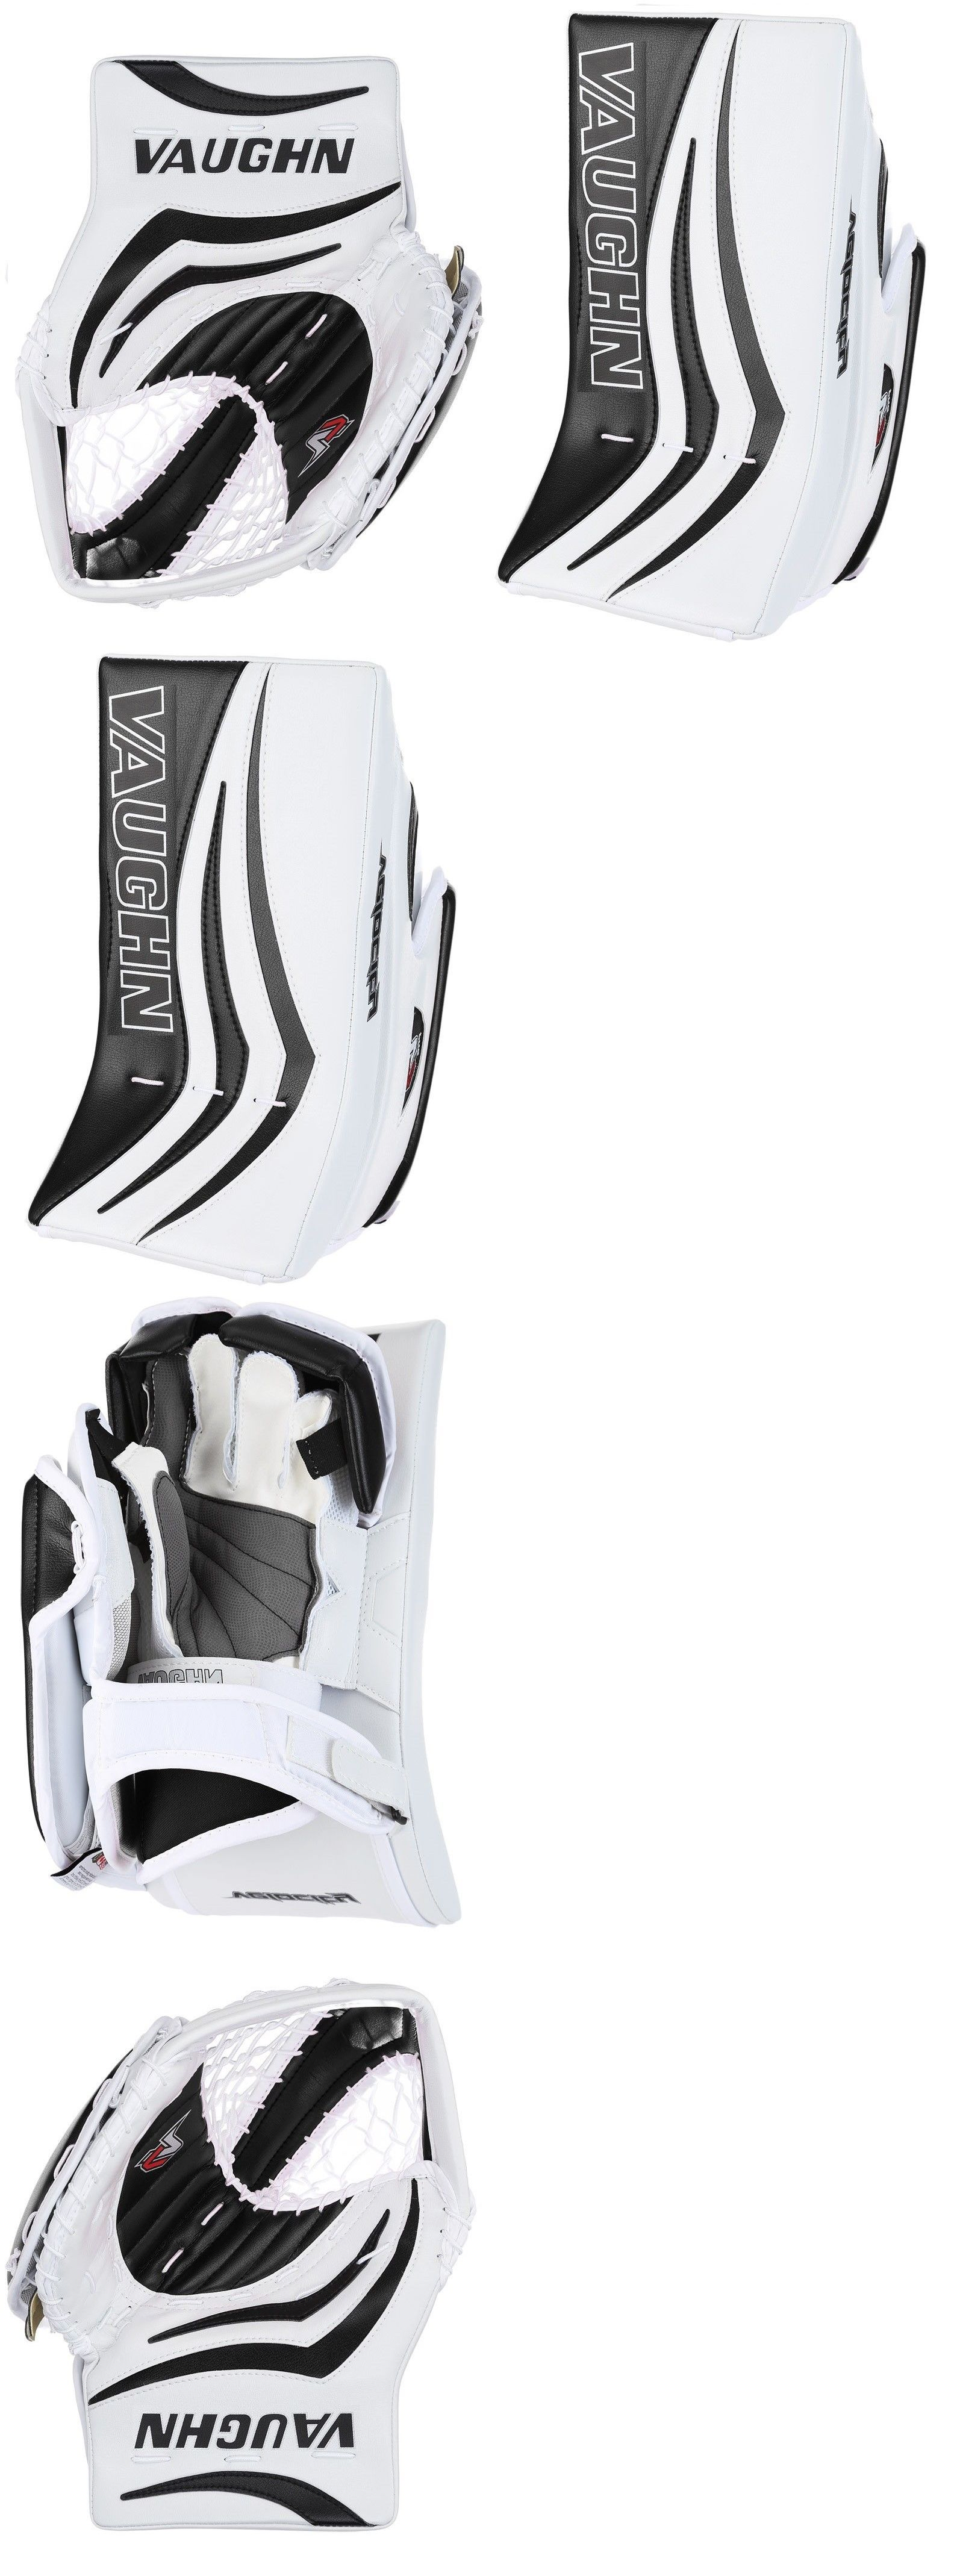 d365c4d85b4 Gloves and Blockers 79763  Vaughn Xr Pro Hockey Goalie Blocker Glove Sr  Full Right Velocity